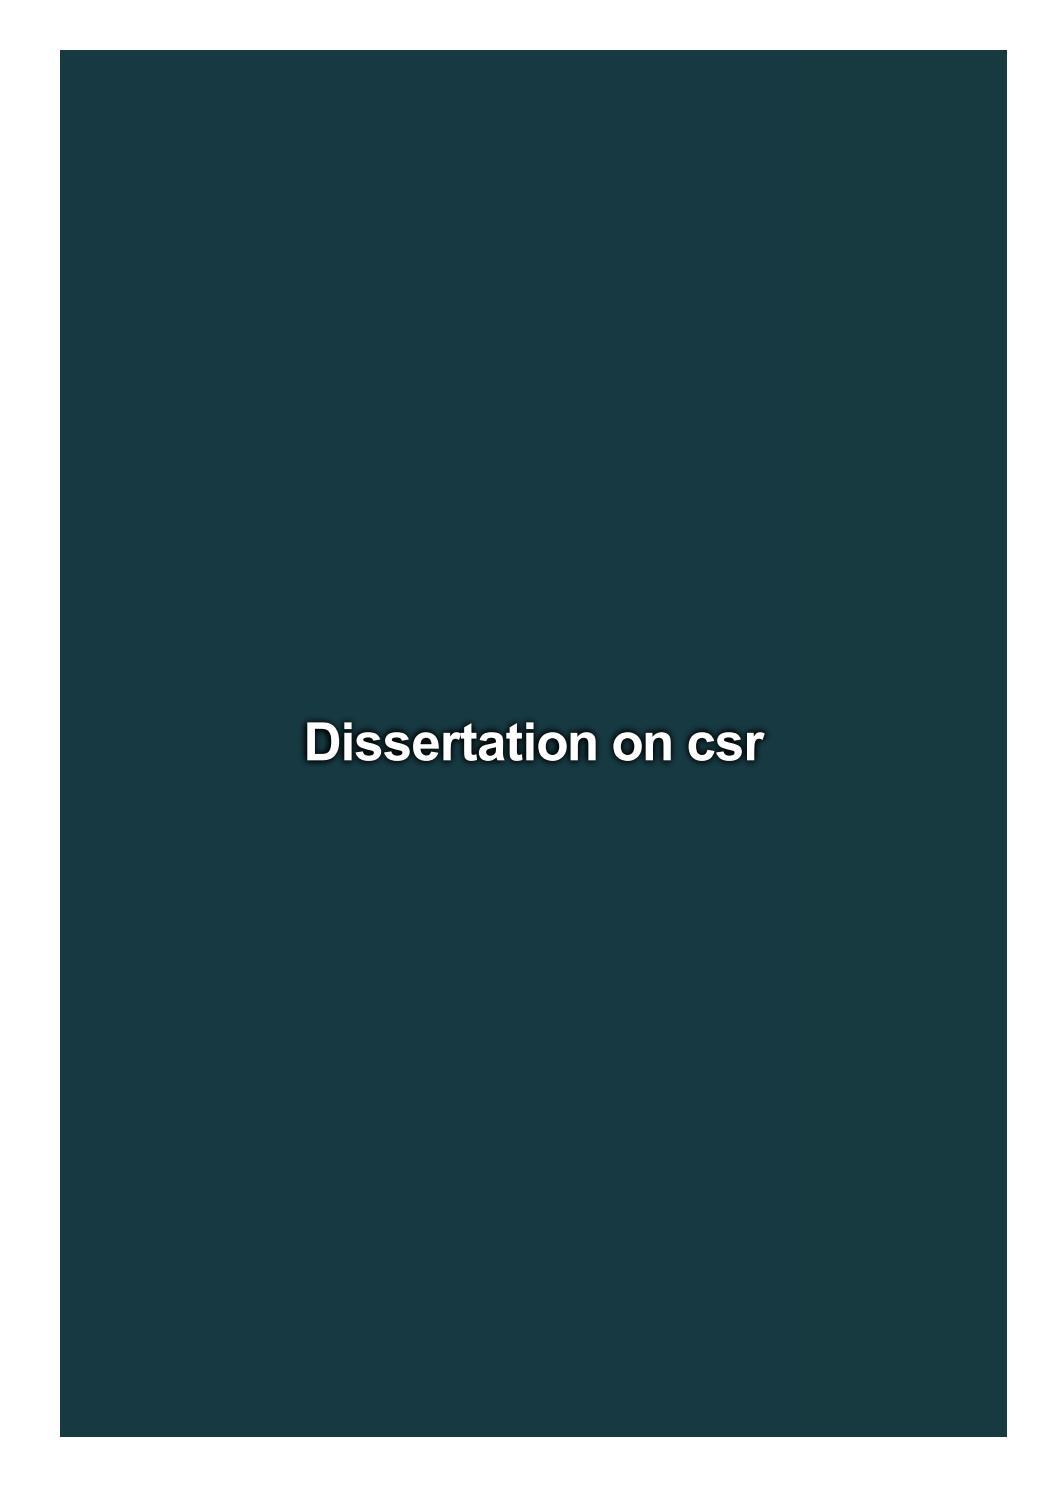 Csr dissertation term paper format apa